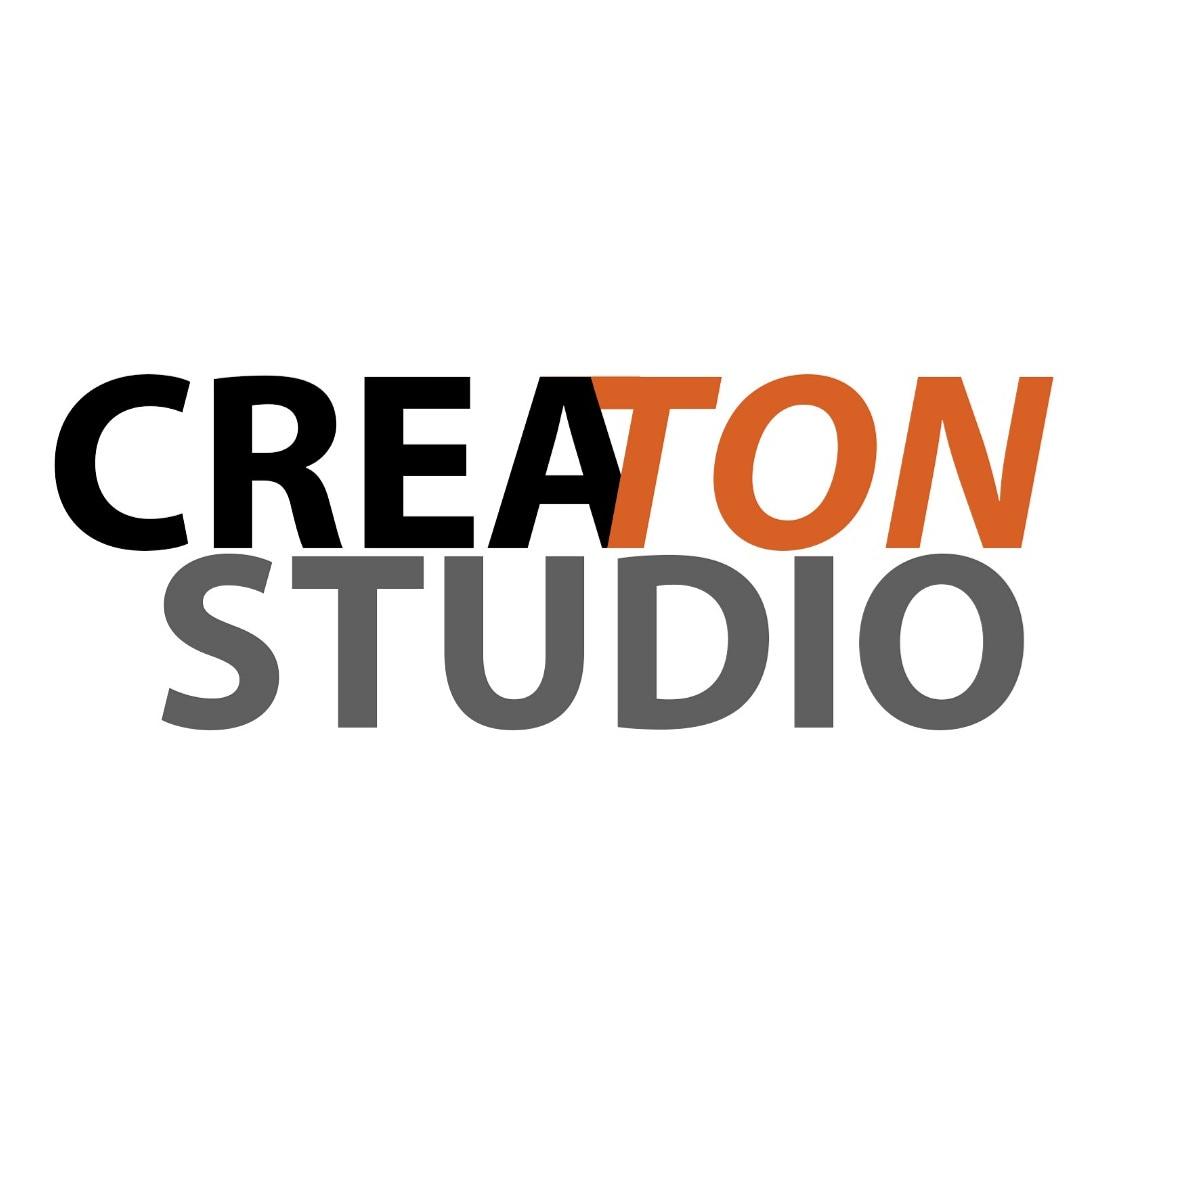 Creaton Studio